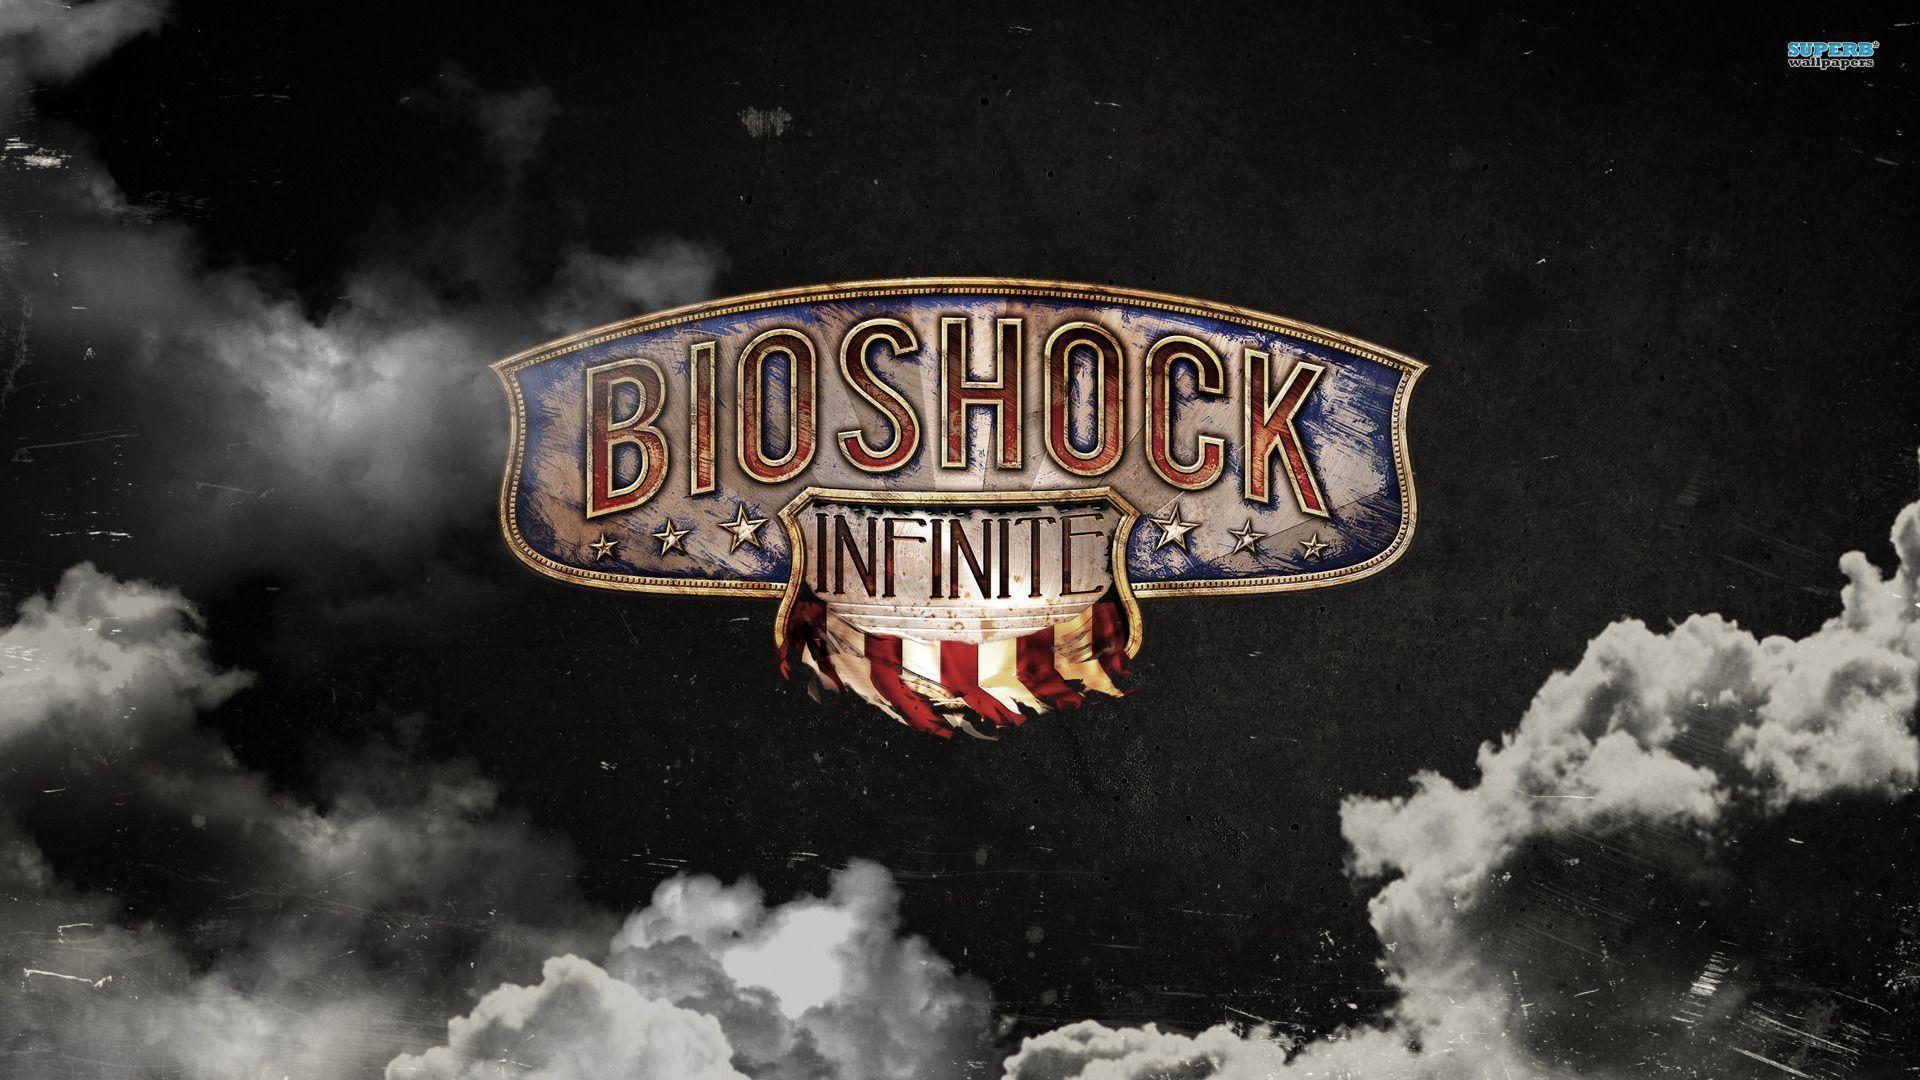 BioShock Infinite Wallpapers 1920x1080 - Wallpaper Cave